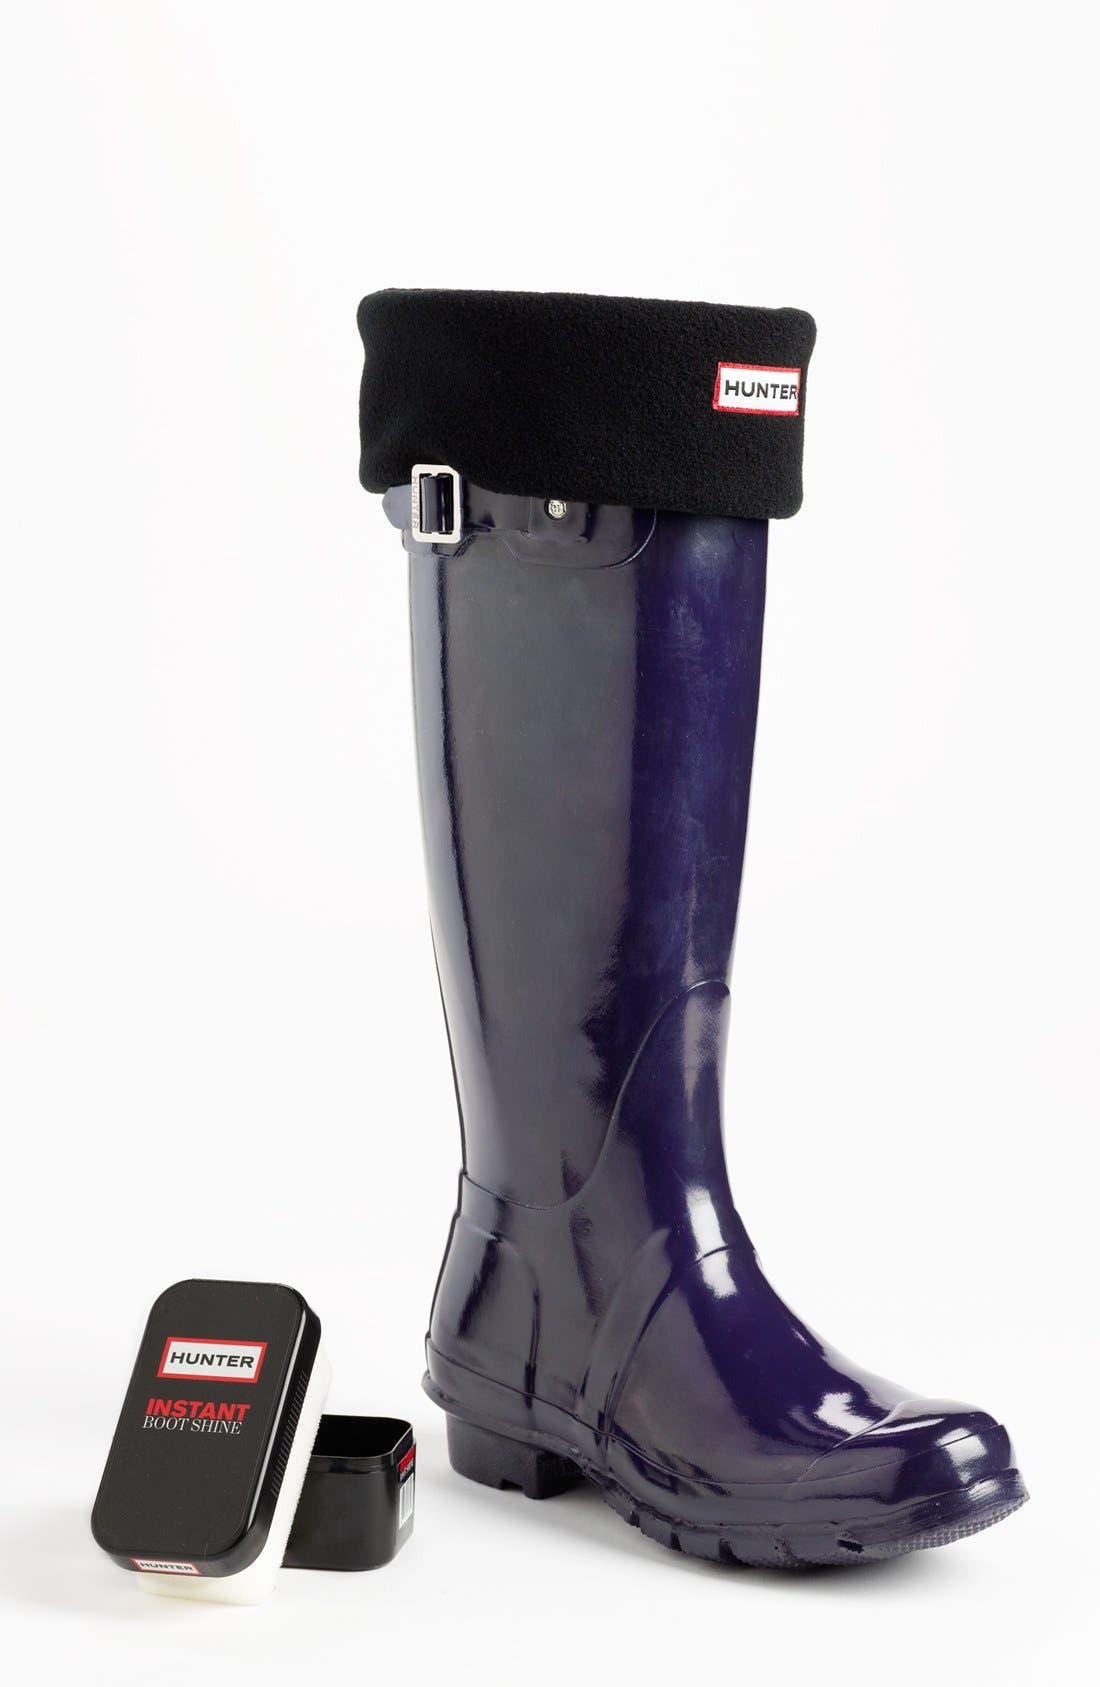 Hunter 'Original Tall' Gloss Rain Boot, Fleece Welly Socks & Instant Boot Shine Sponge